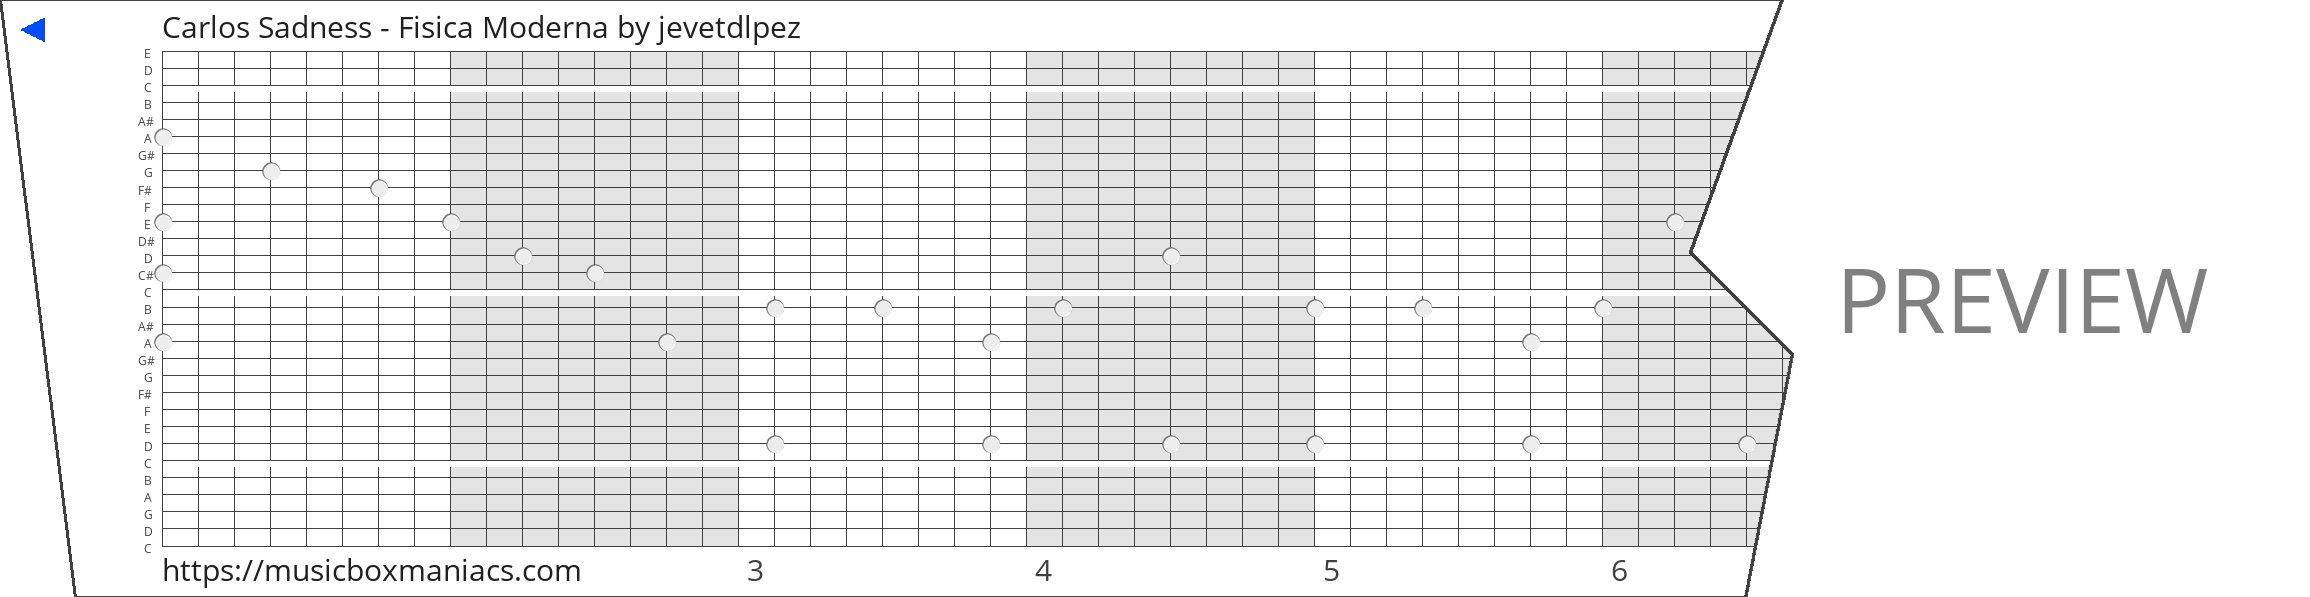 Carlos Sadness - Fisica Moderna 30 note music box paper strip